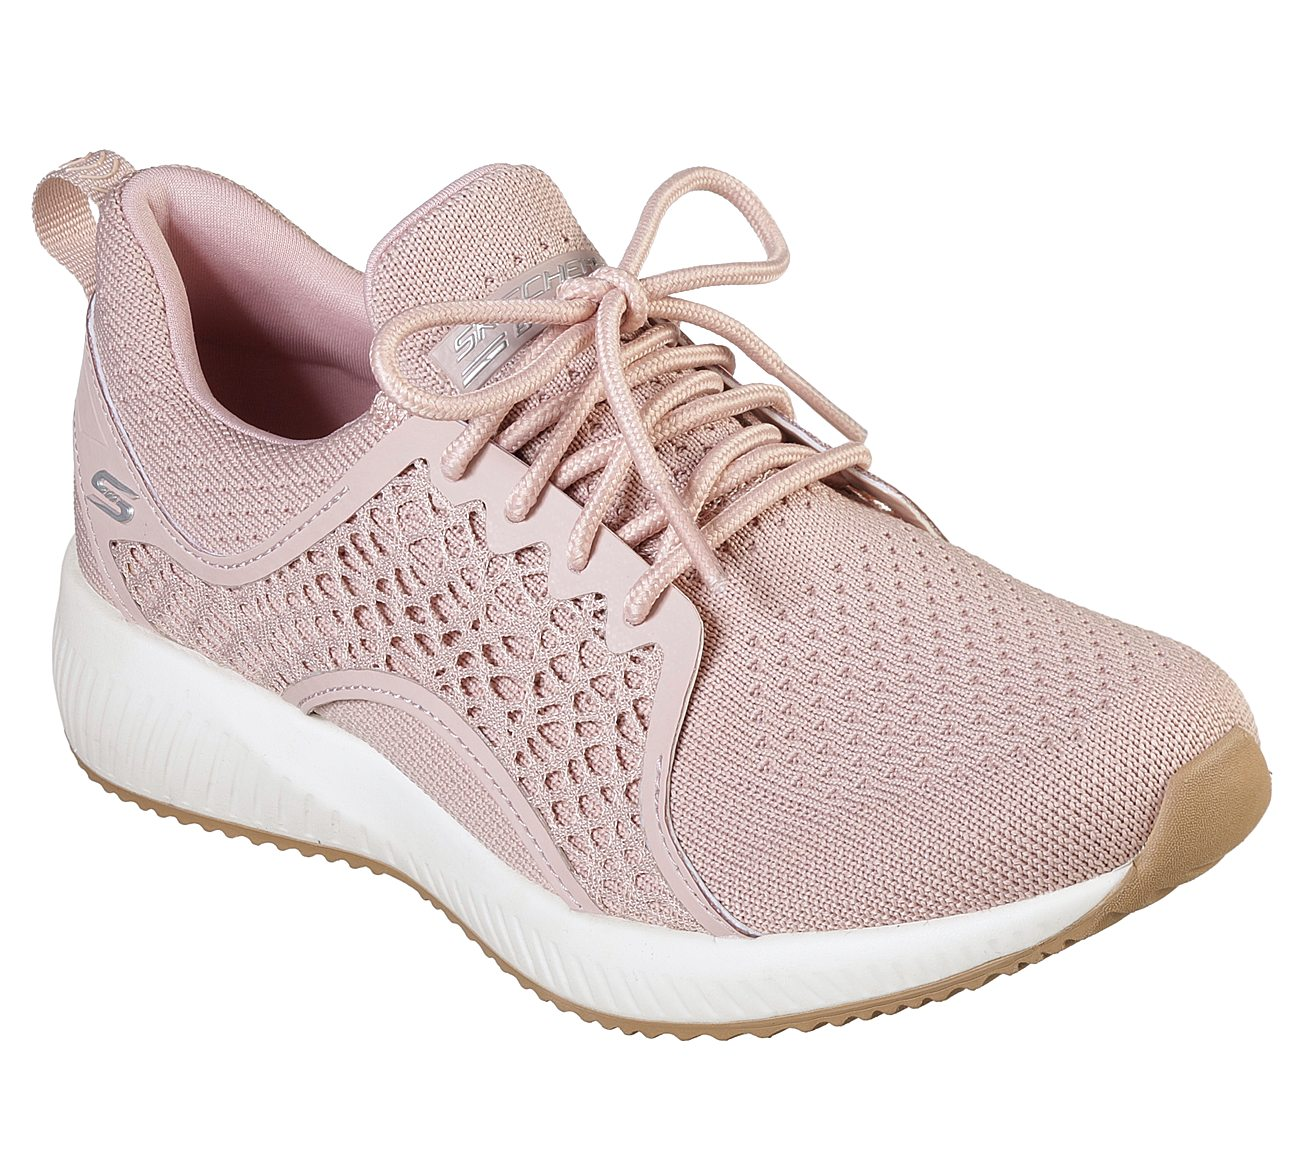 c9692e17c09d Buy SKECHERS BOBS Sport Squad - Pocket Ace BOBS Shoes only  55.00